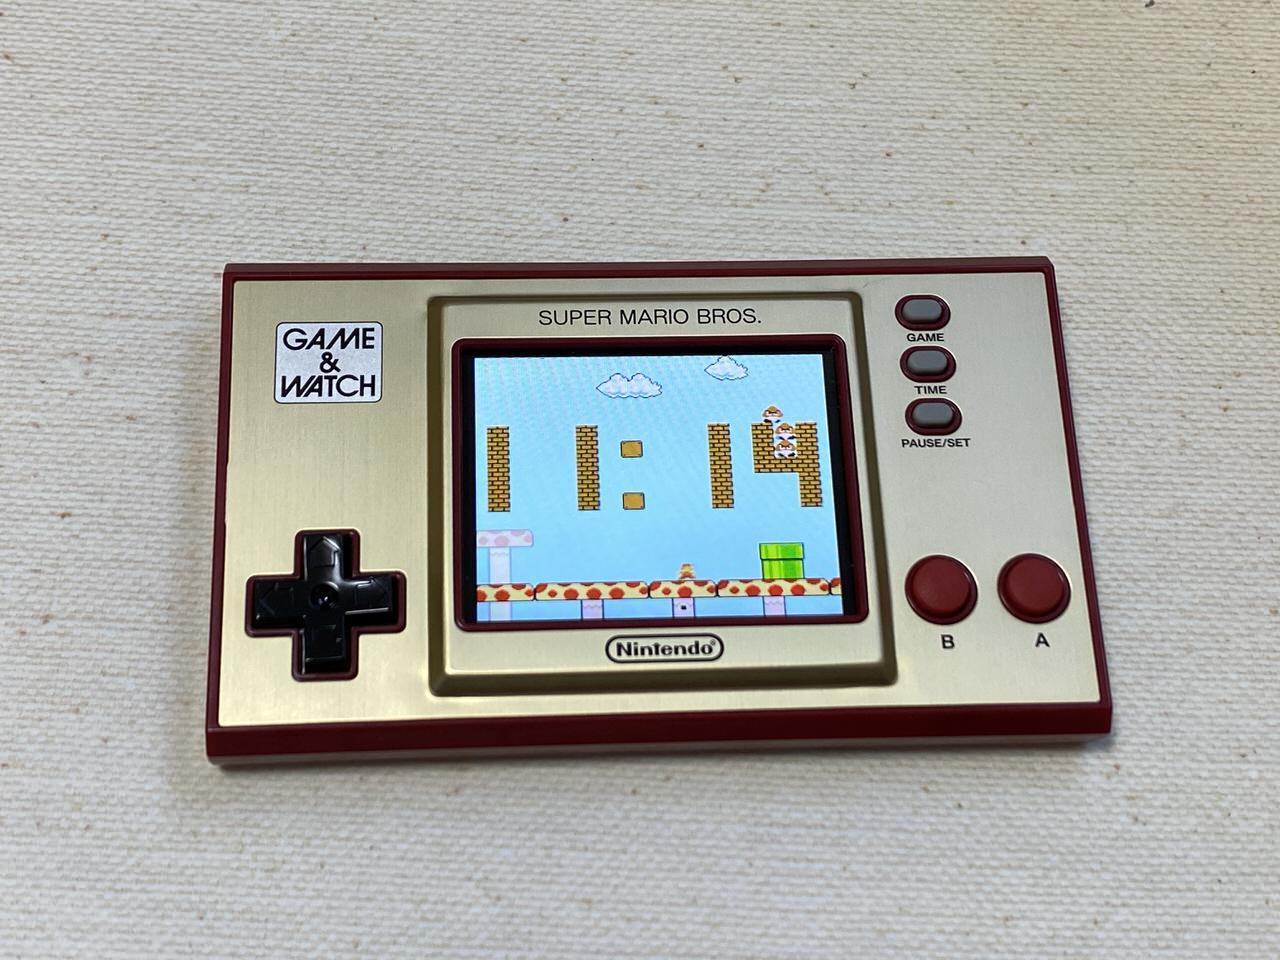 Nintendo gamewatch 202011 4